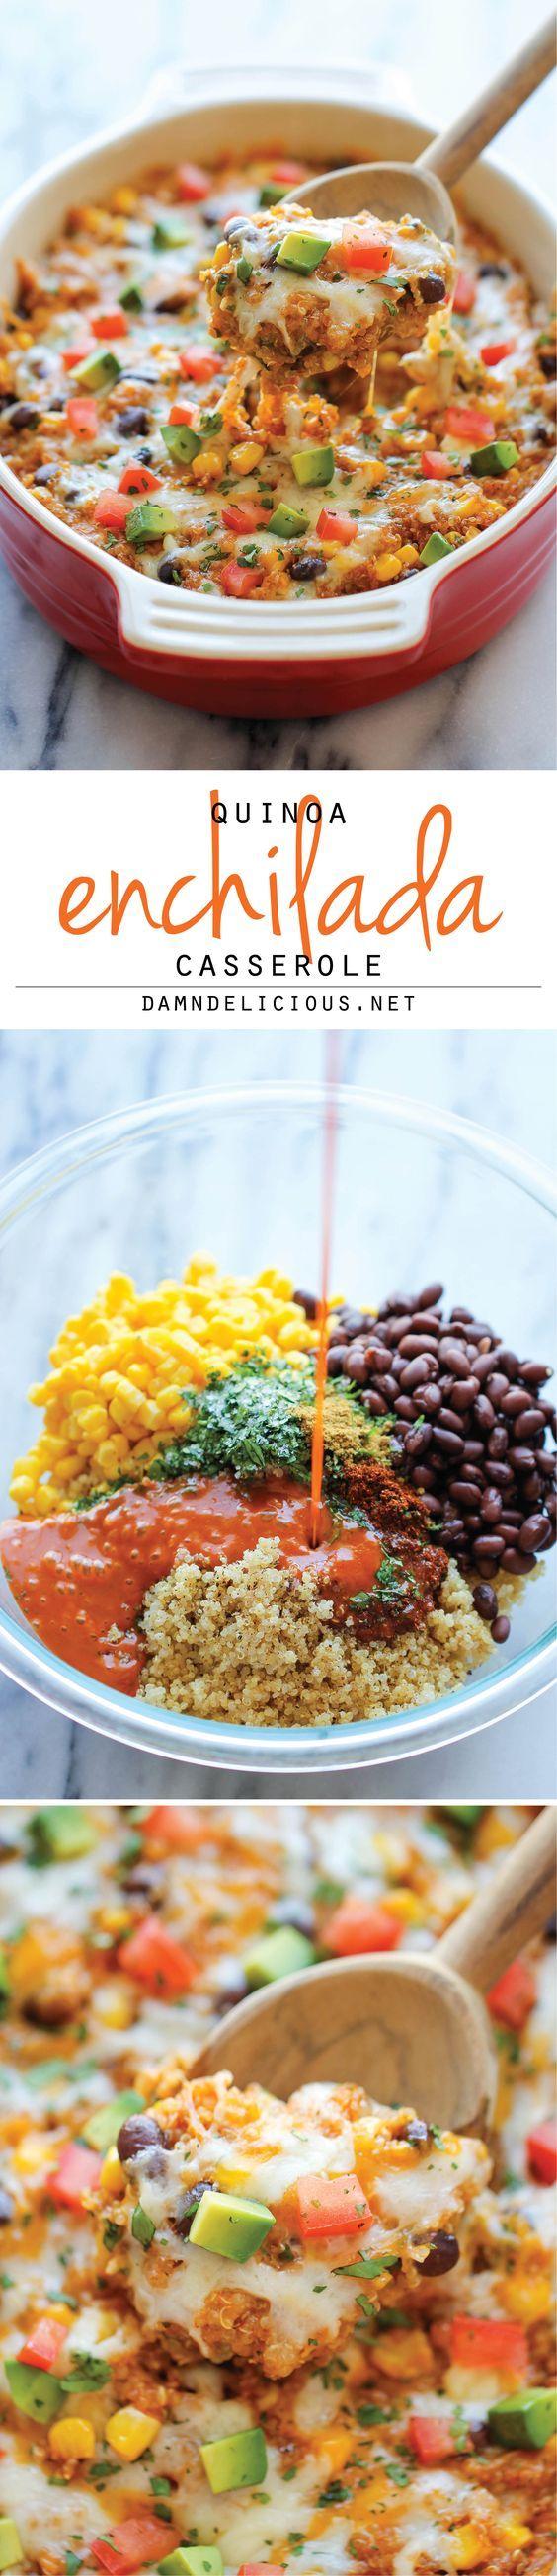 Quinoa Enchilada Casserole - A lightened-up healthy enchilada bake chockfull of quinoa black beans and cheesy goodness!